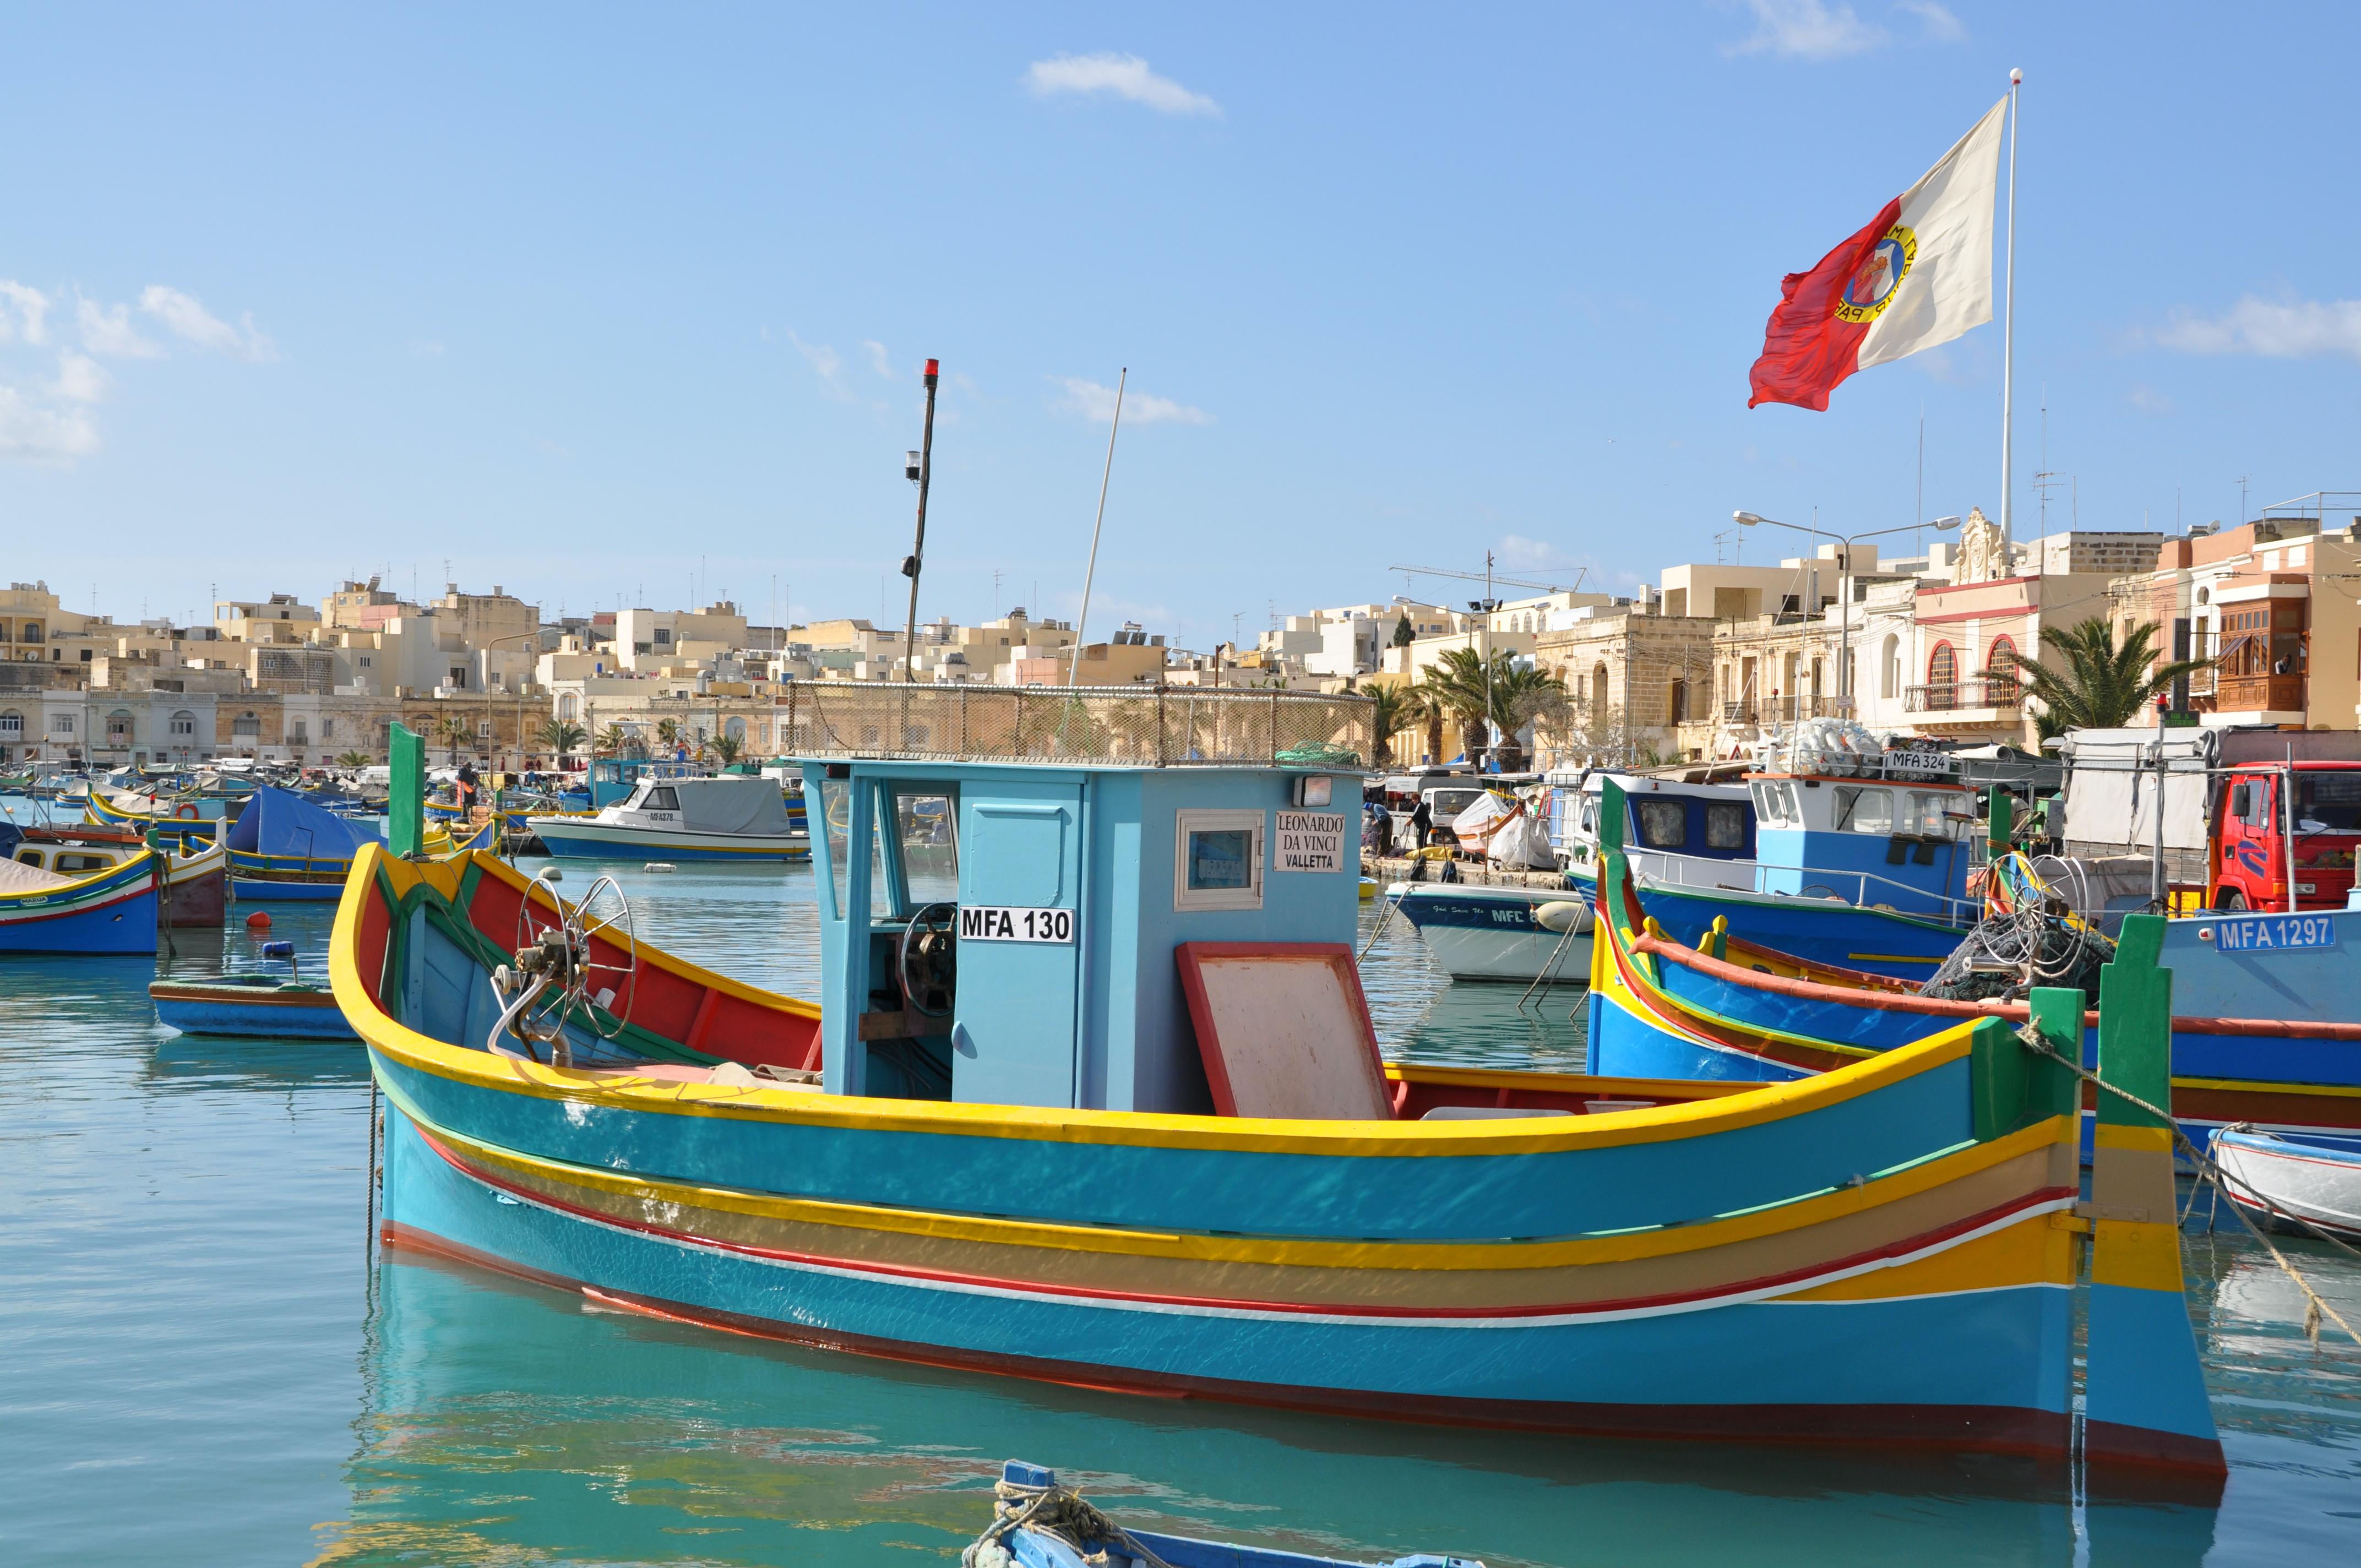 Malta - Feb 21 2010 - 10